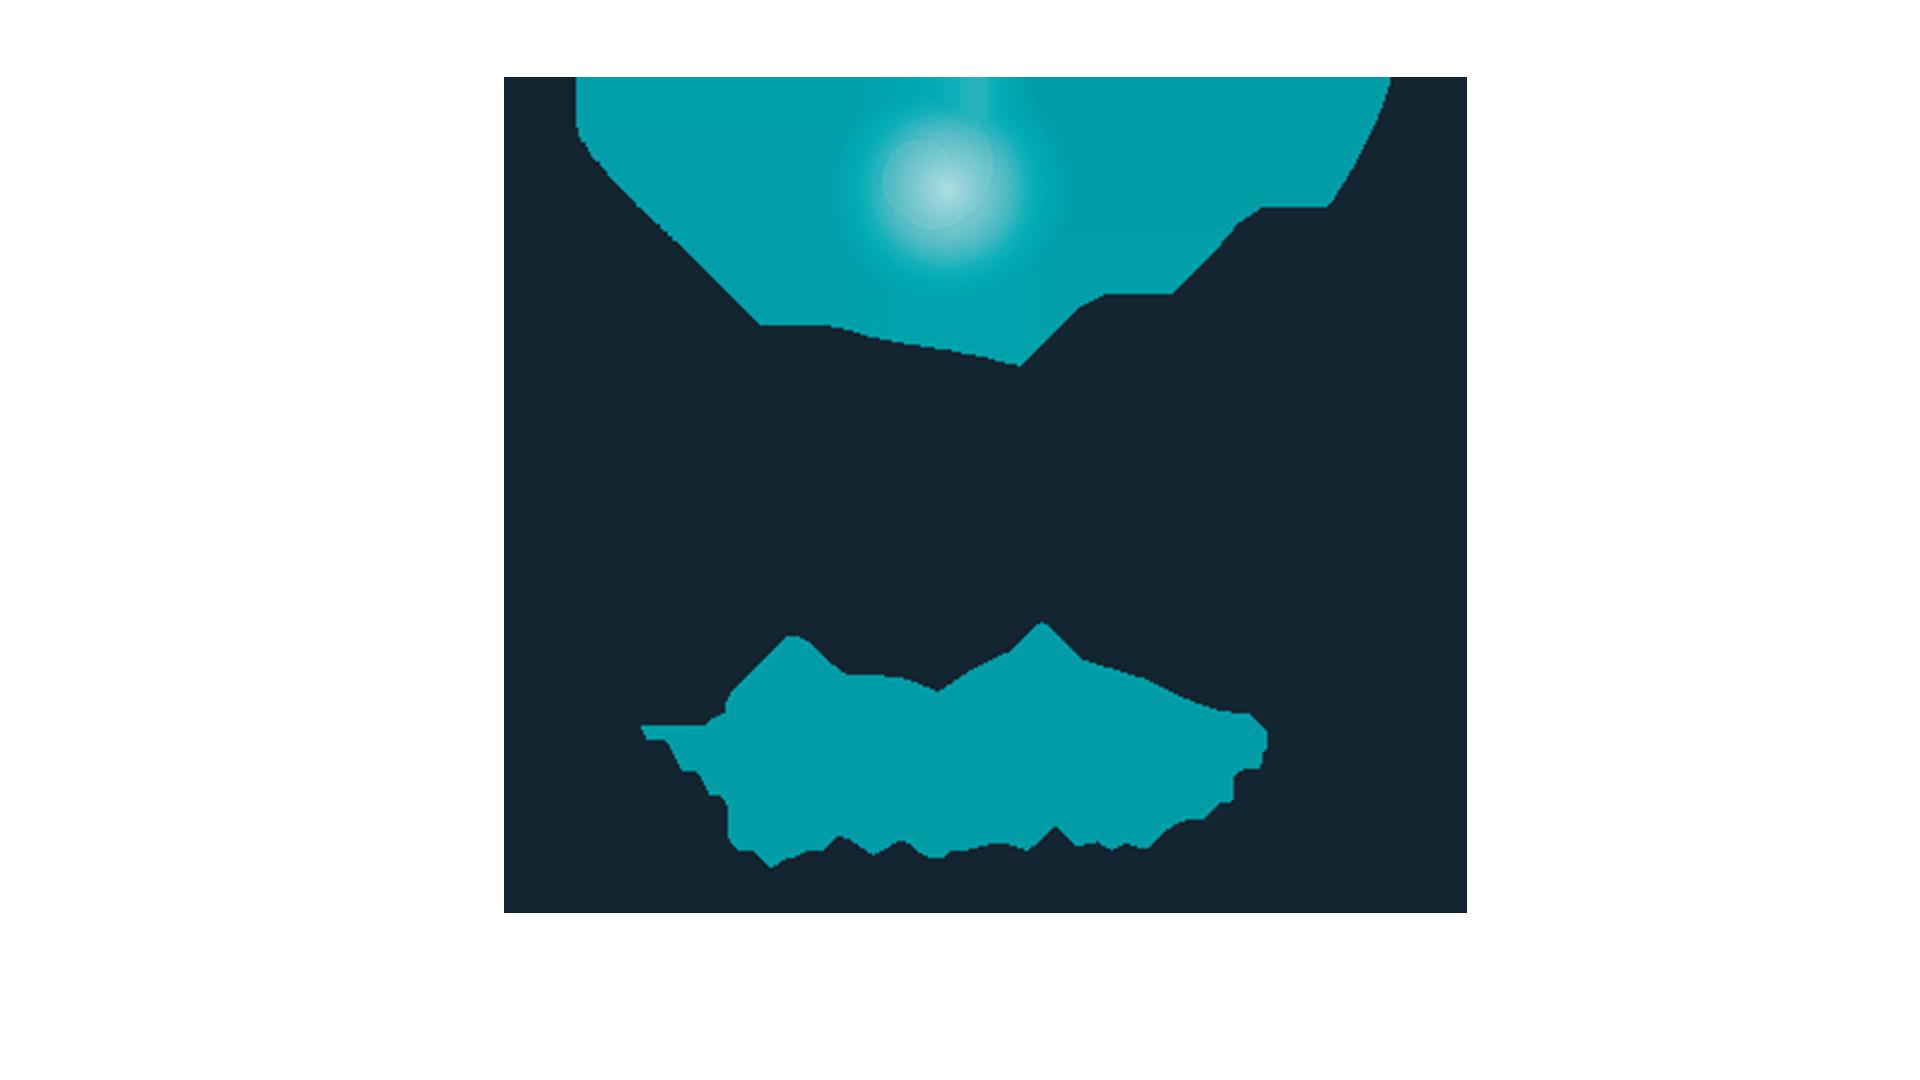 cheer_sponsor_jade_logo_1920x1080